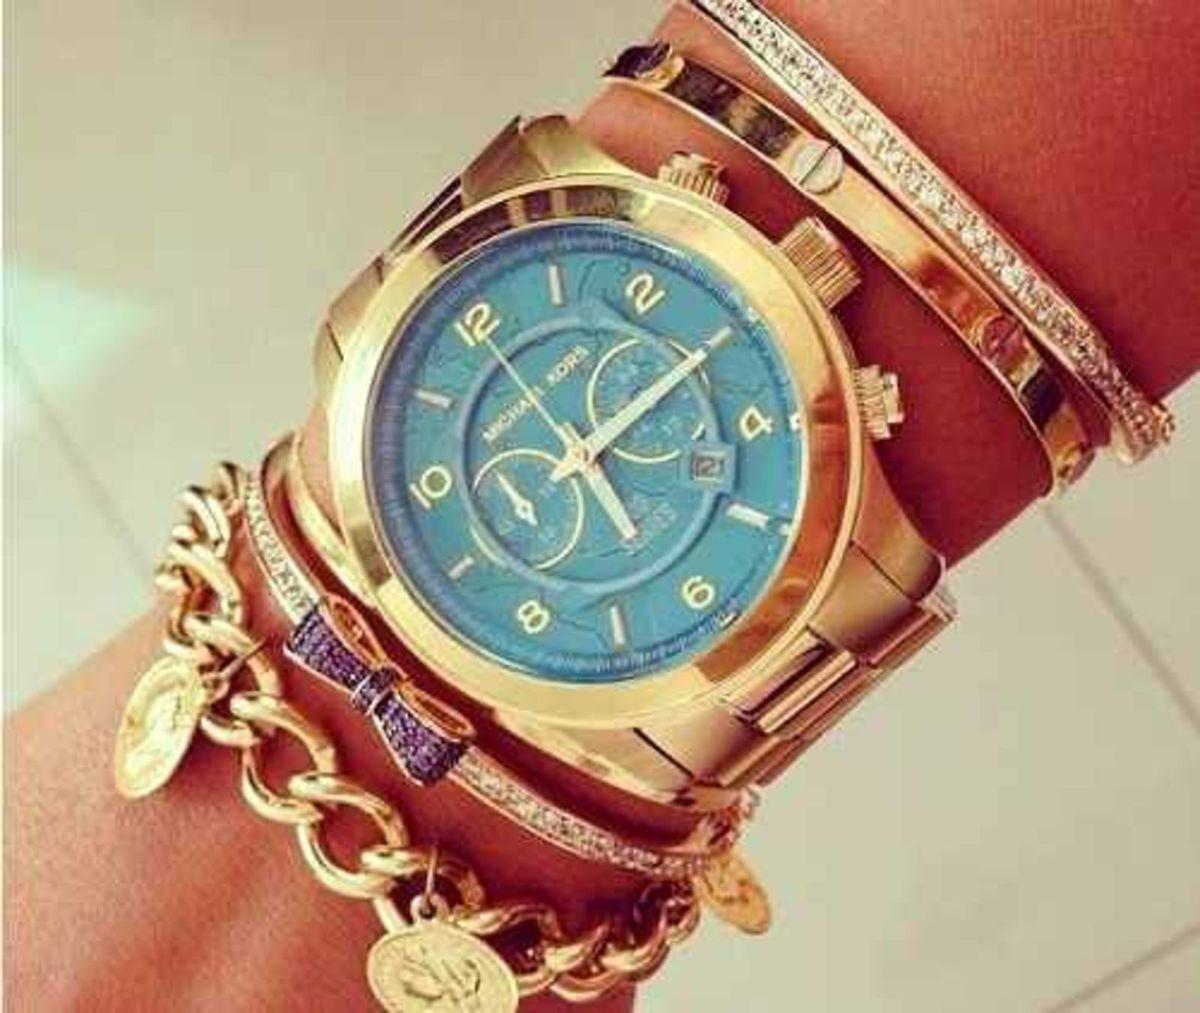 4250d87a9164b relogio michael kors mk8315 oversized azul turquesa original - relógios  michael kors